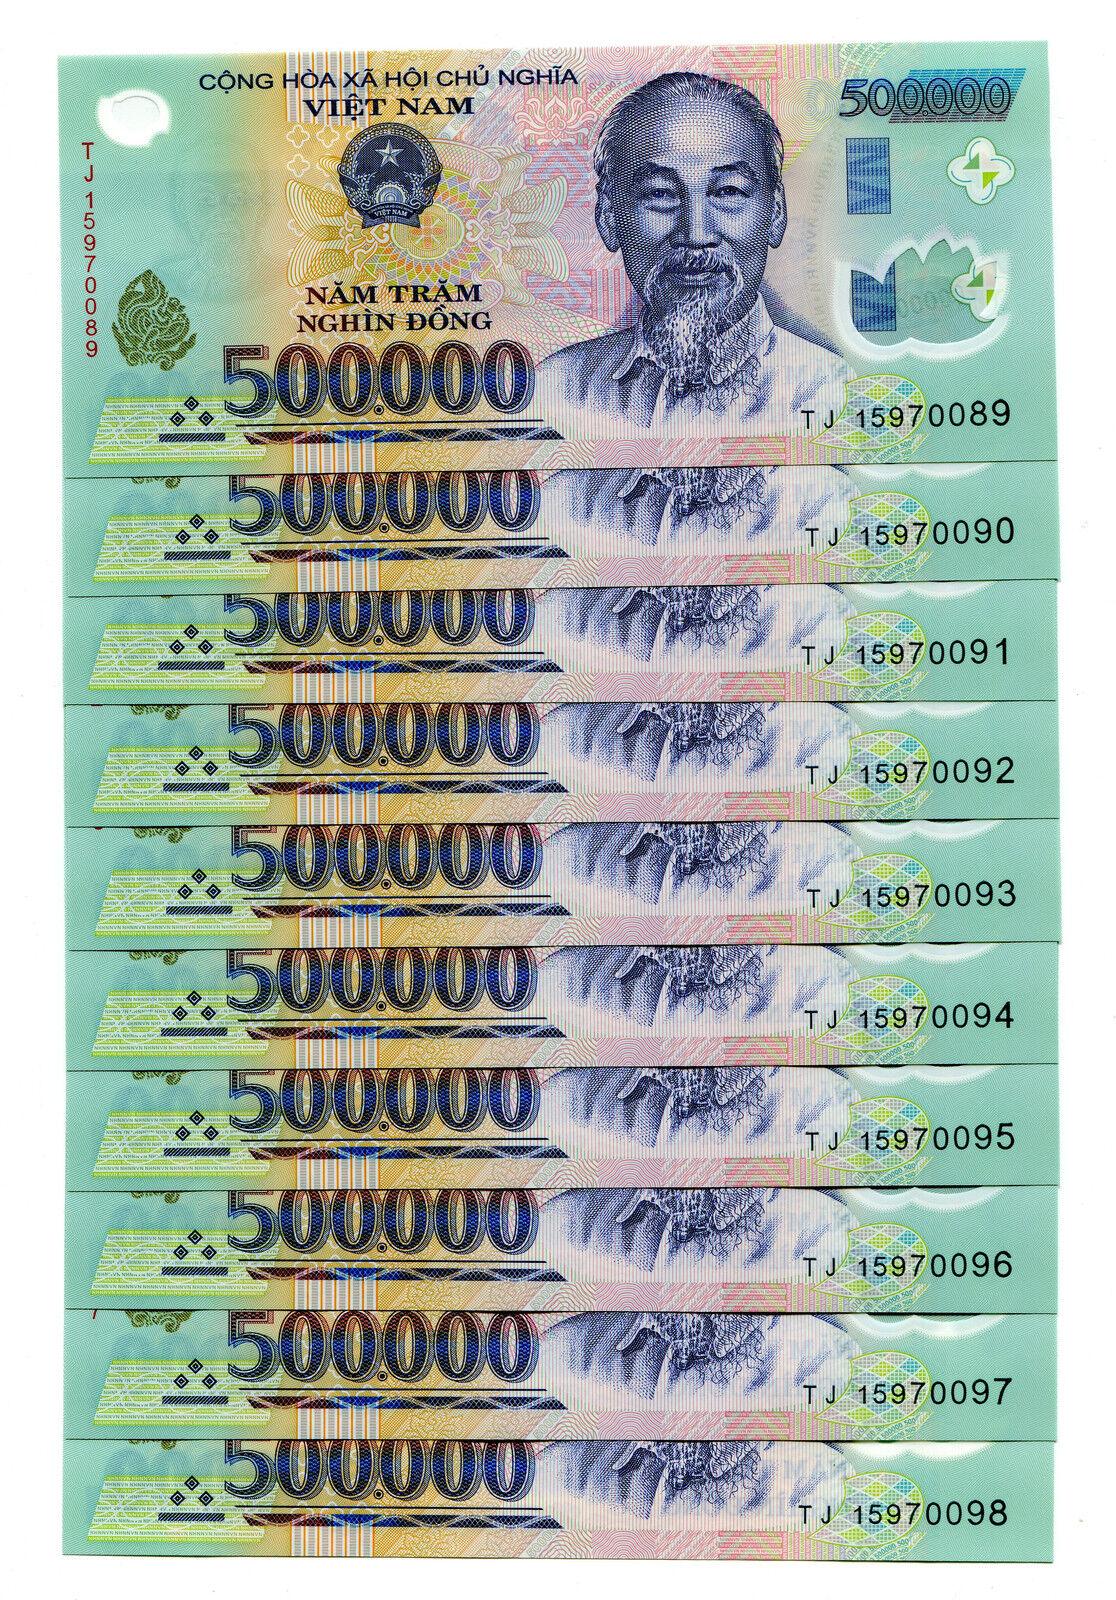 1 MILLION VIETNAM DONG 500k Z 2 Vnd Note 2 x 500,000 Unc Vietnamese Banknotes